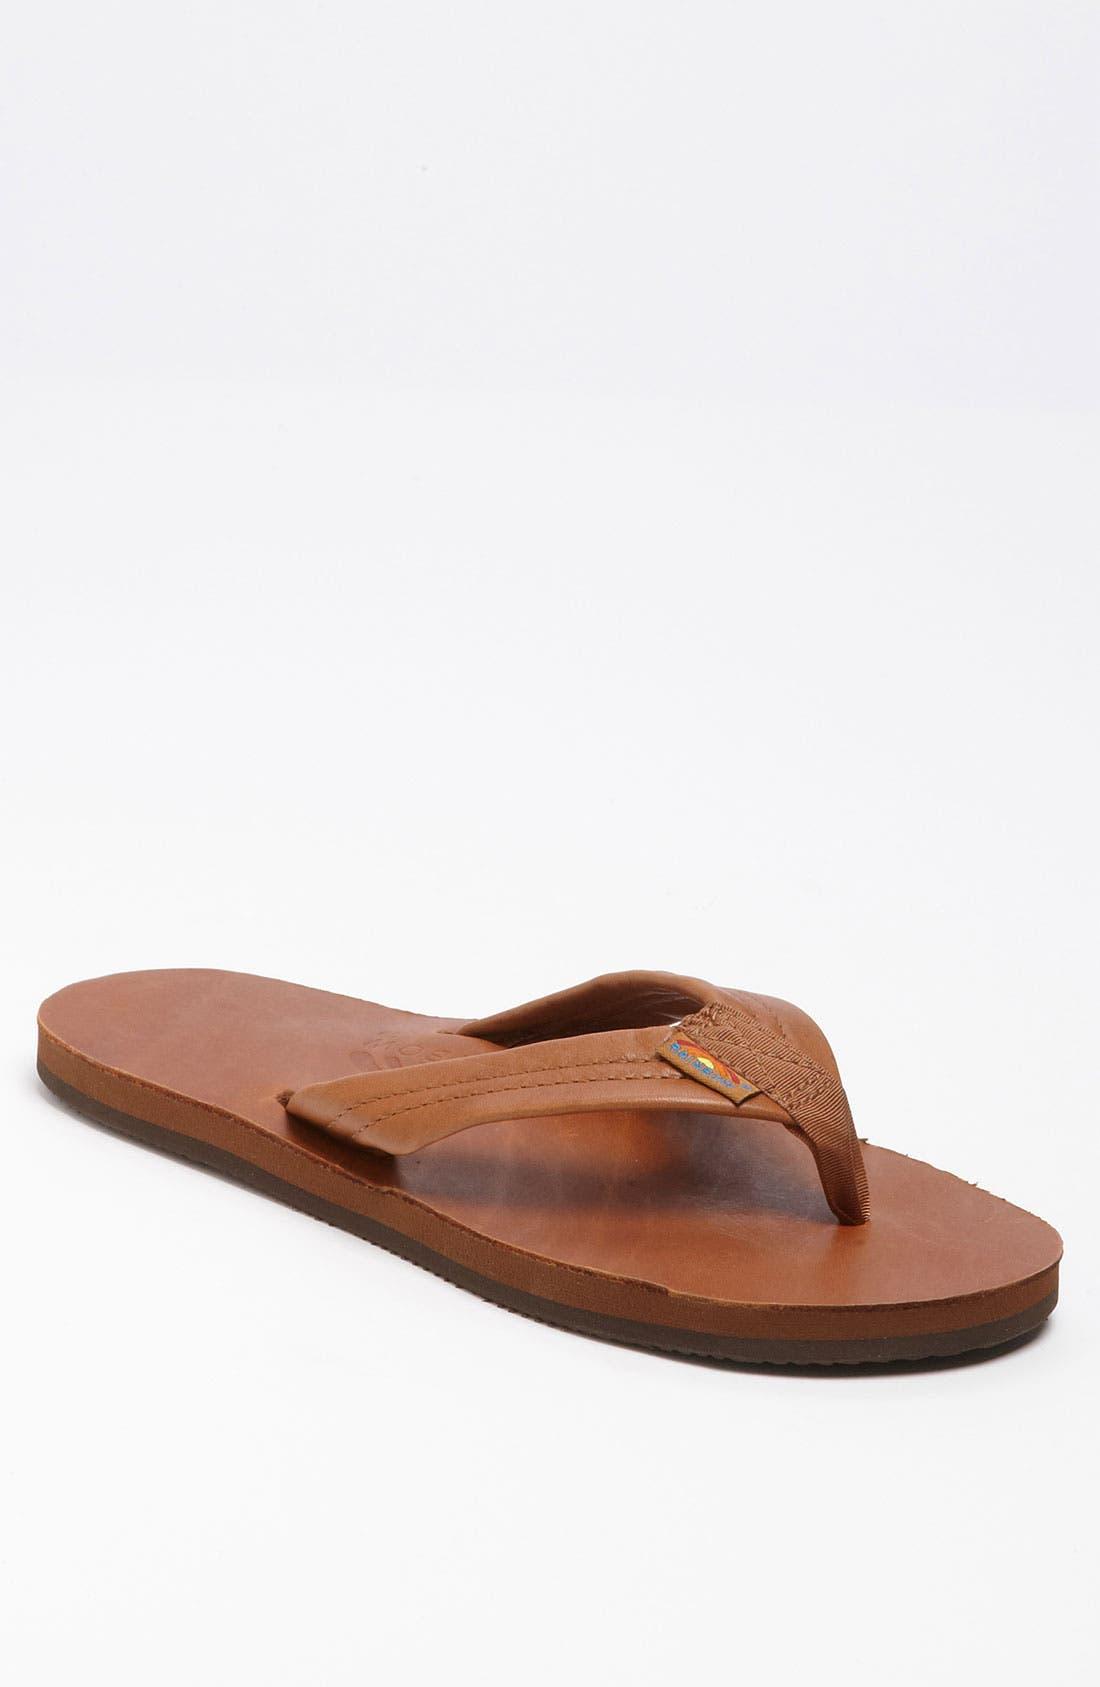 '301Alts' Sandal,                             Main thumbnail 1, color,                             TAN/ BROWN